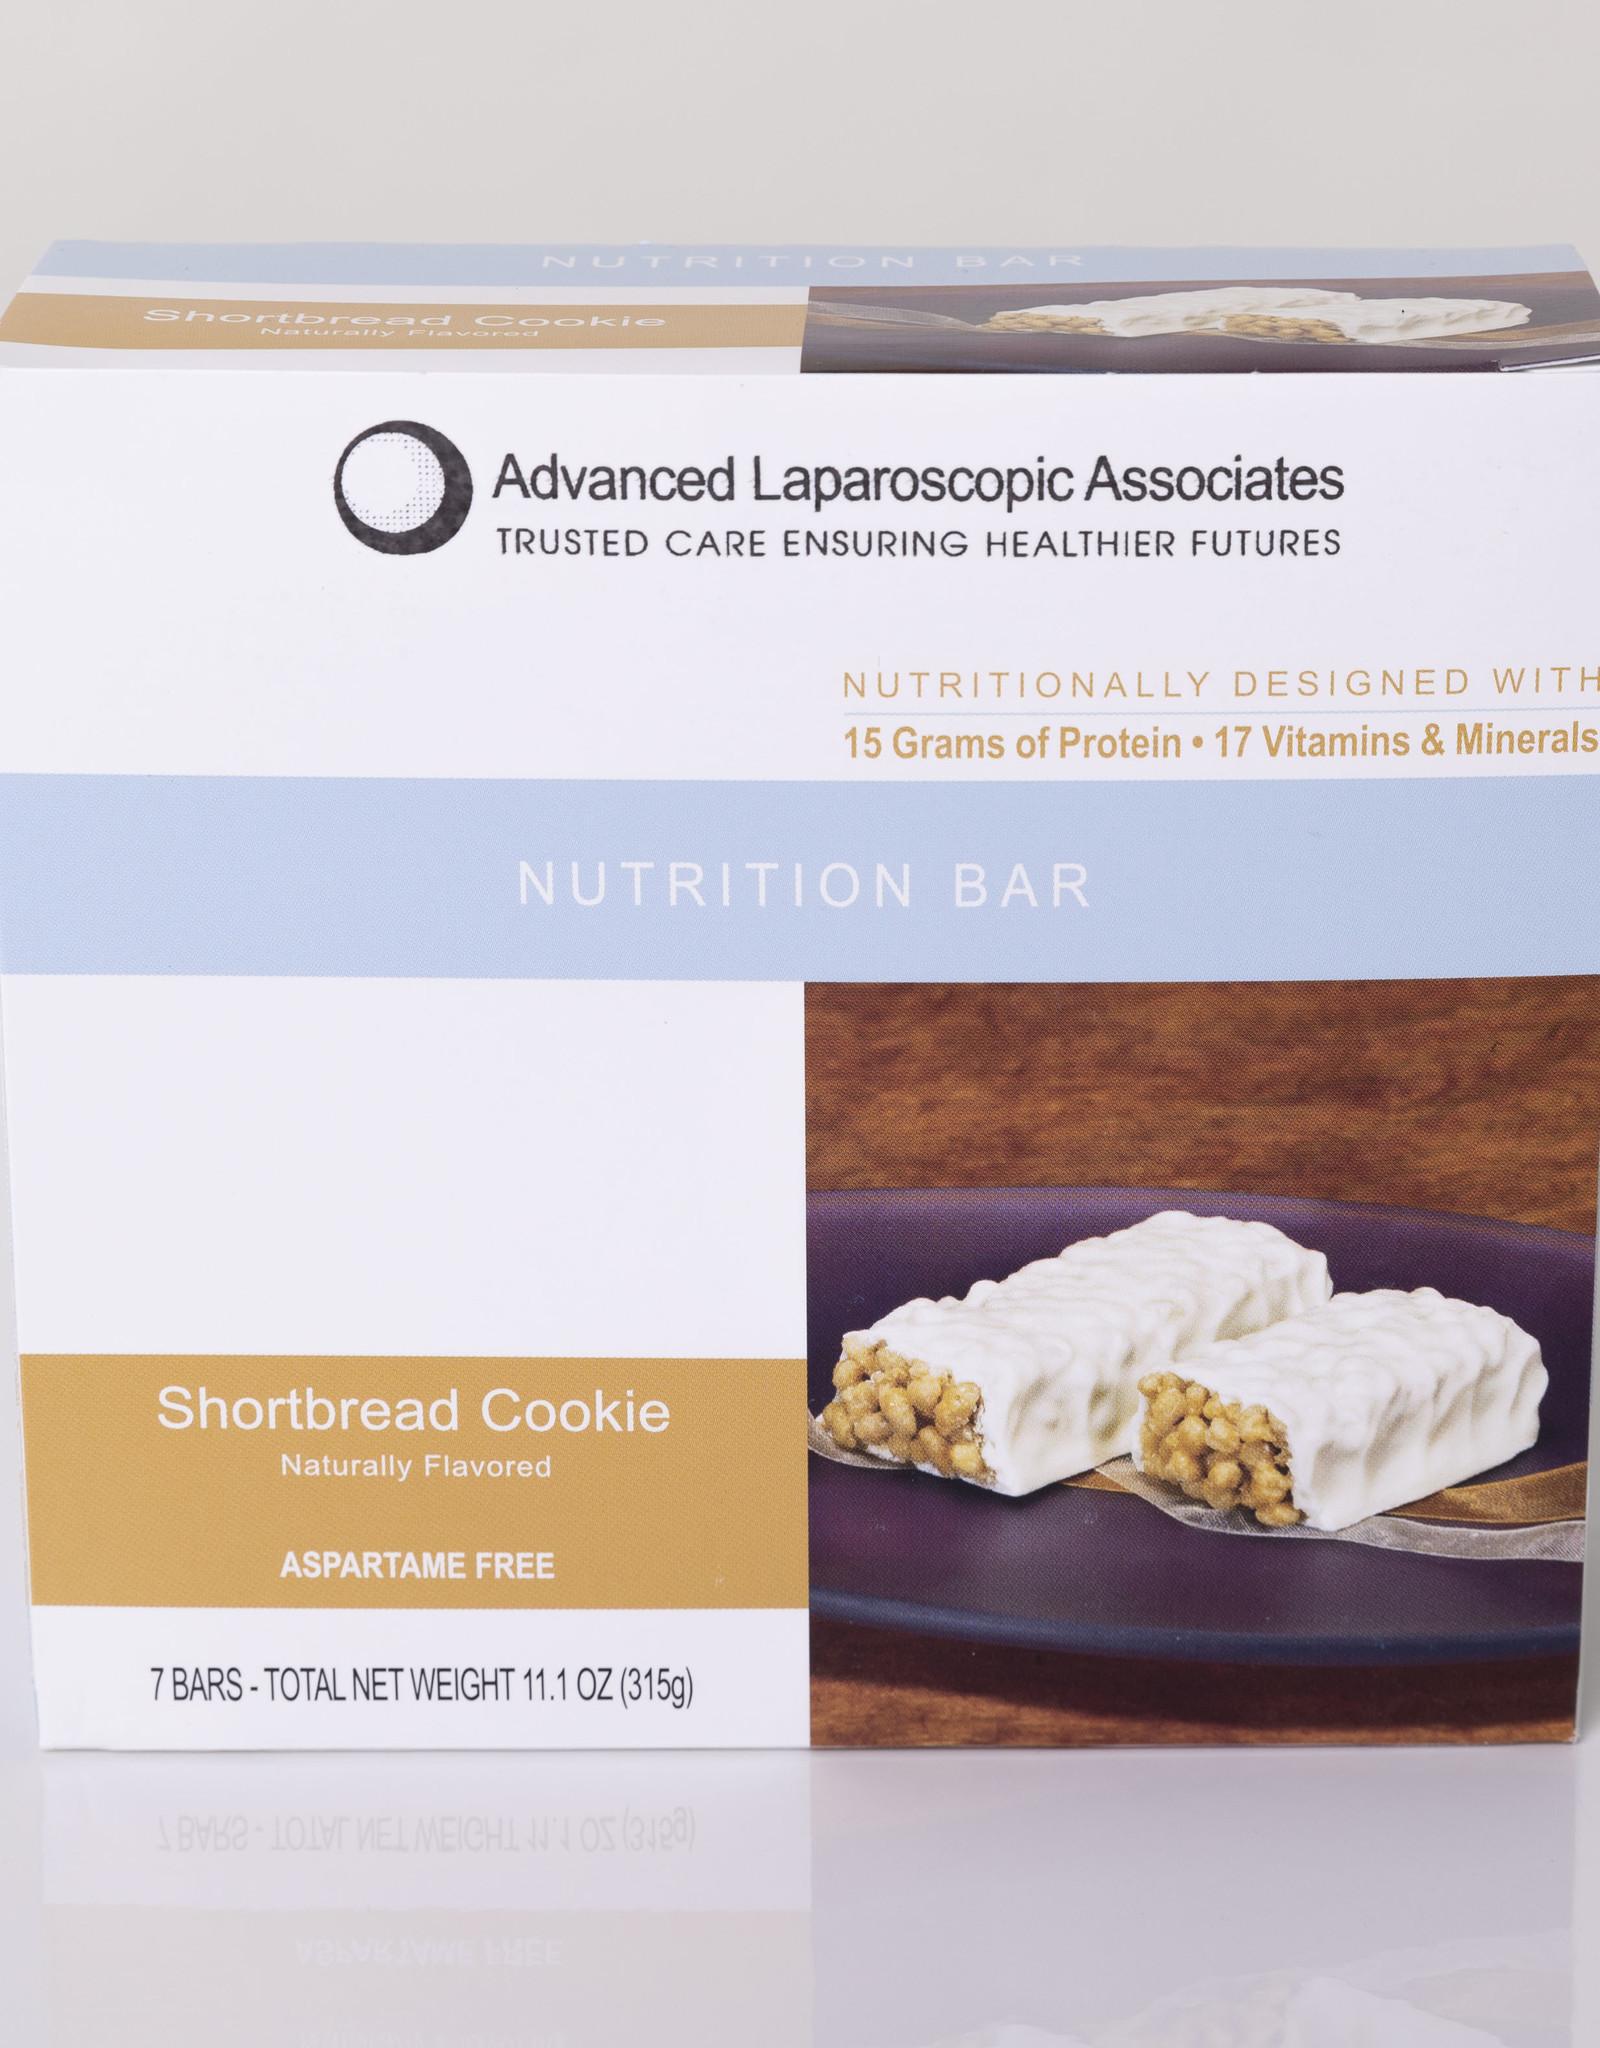 Advanced Laparoscopic Associates Shortbread Cookie Bar